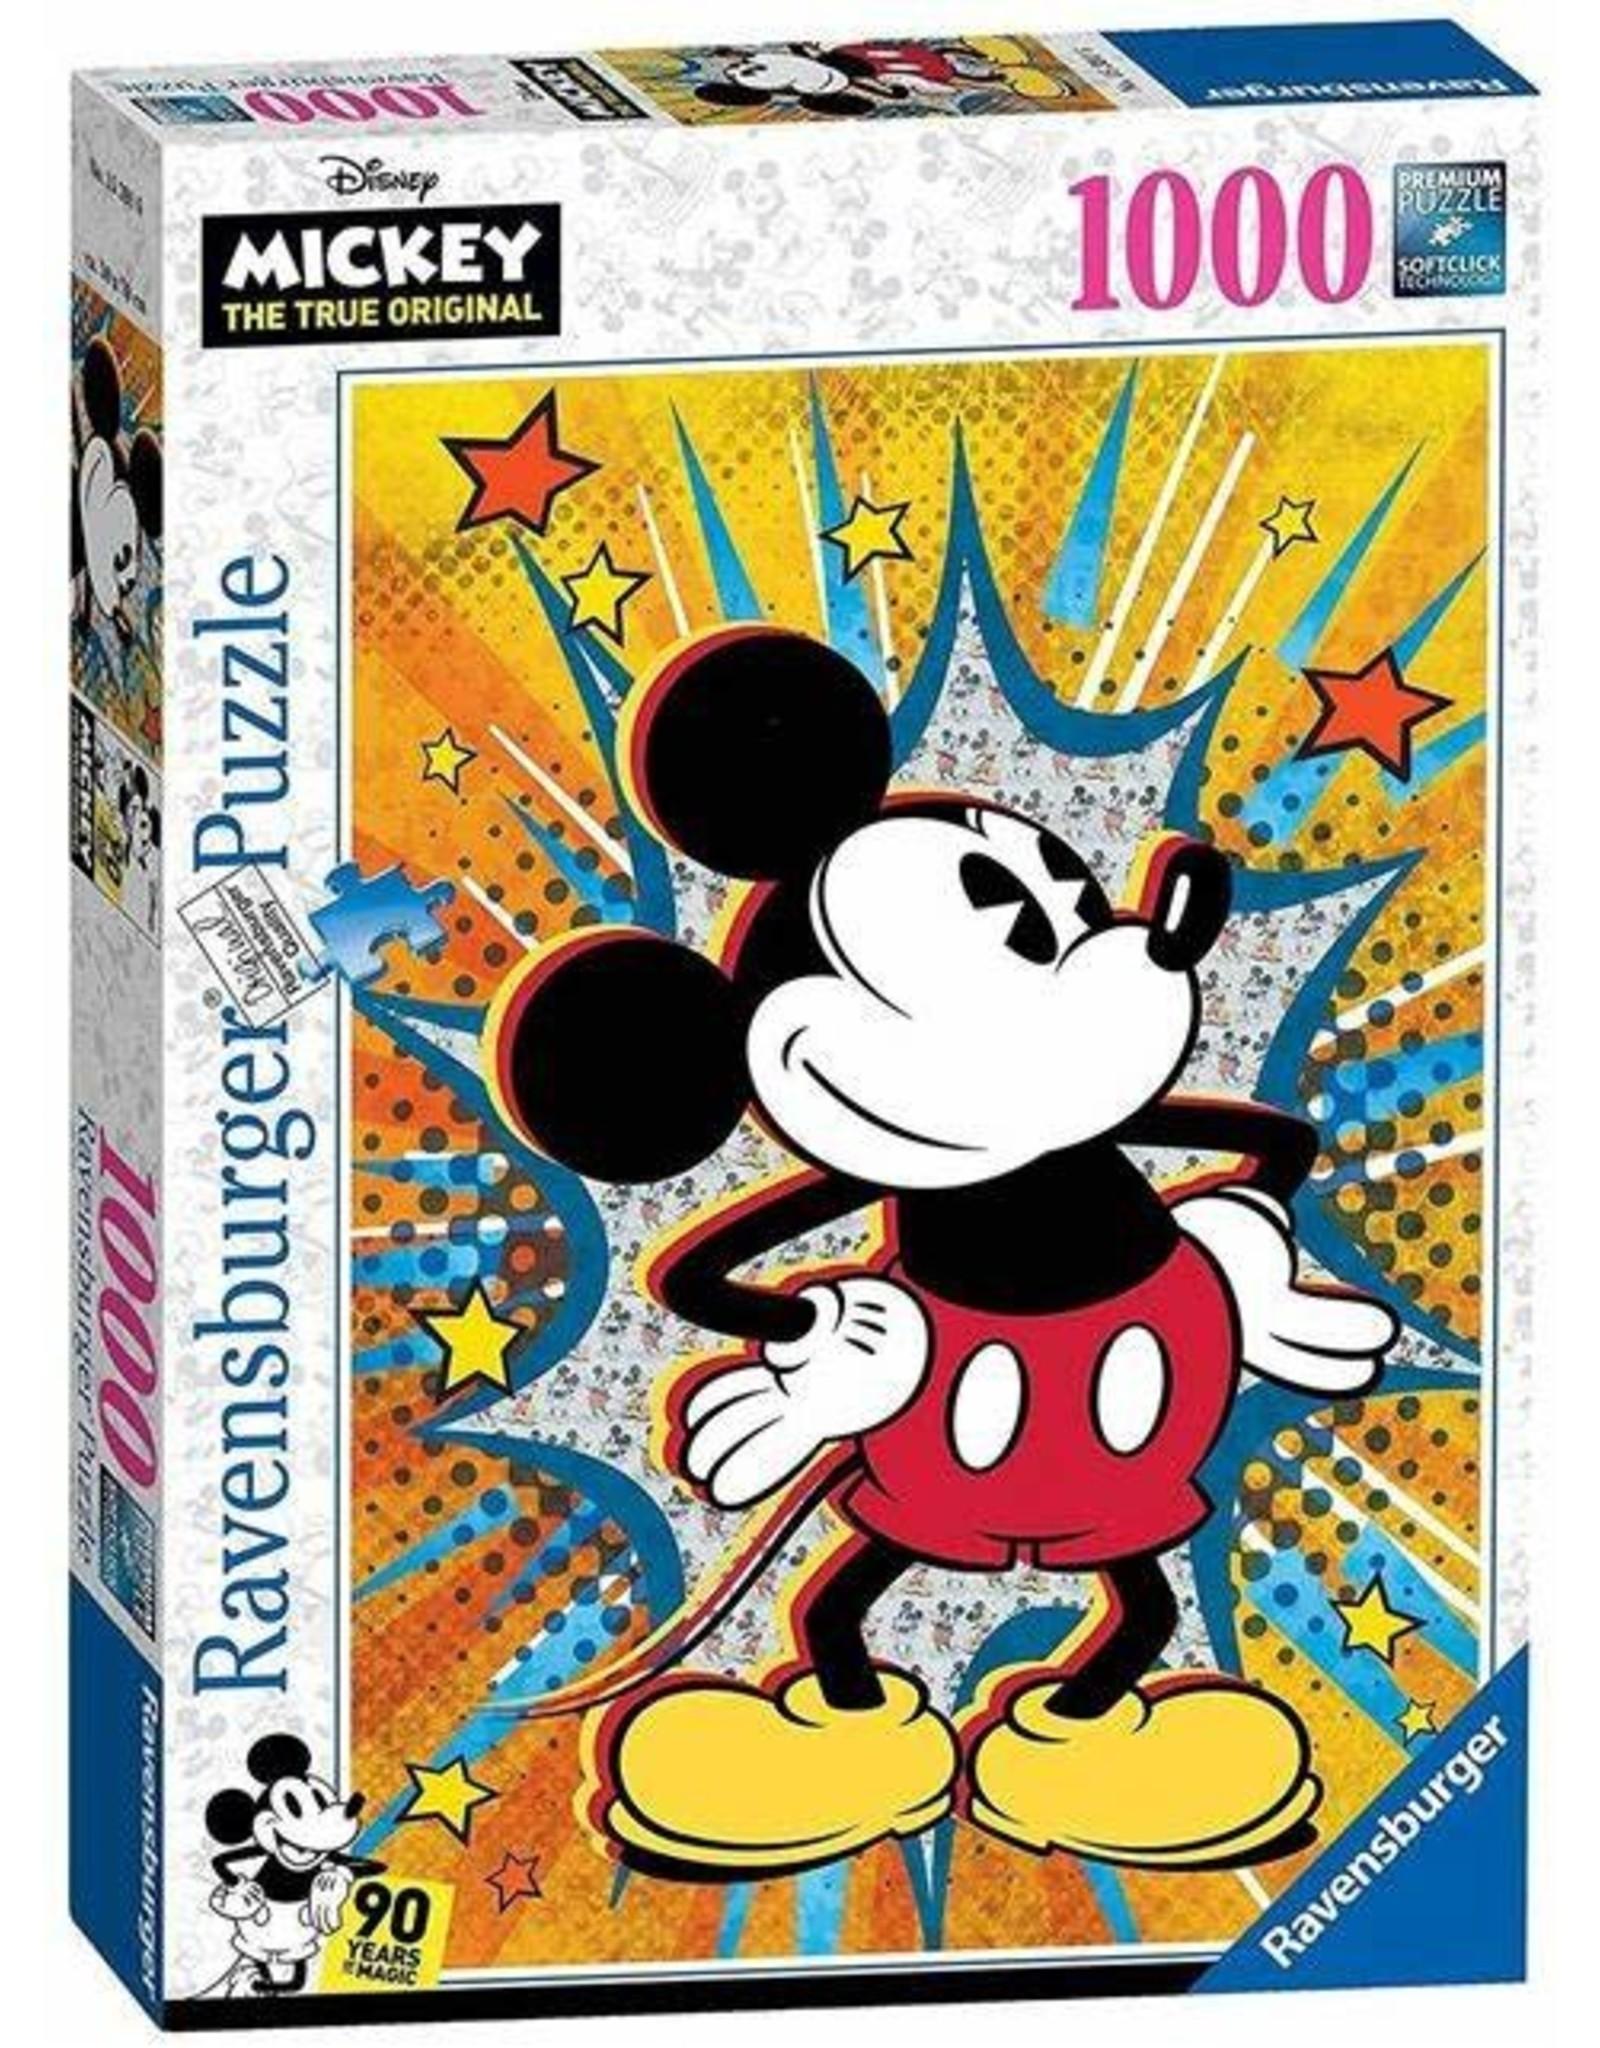 Ravensburger MICKEY MOUSE Puzzle 1000P - Retro Mickey